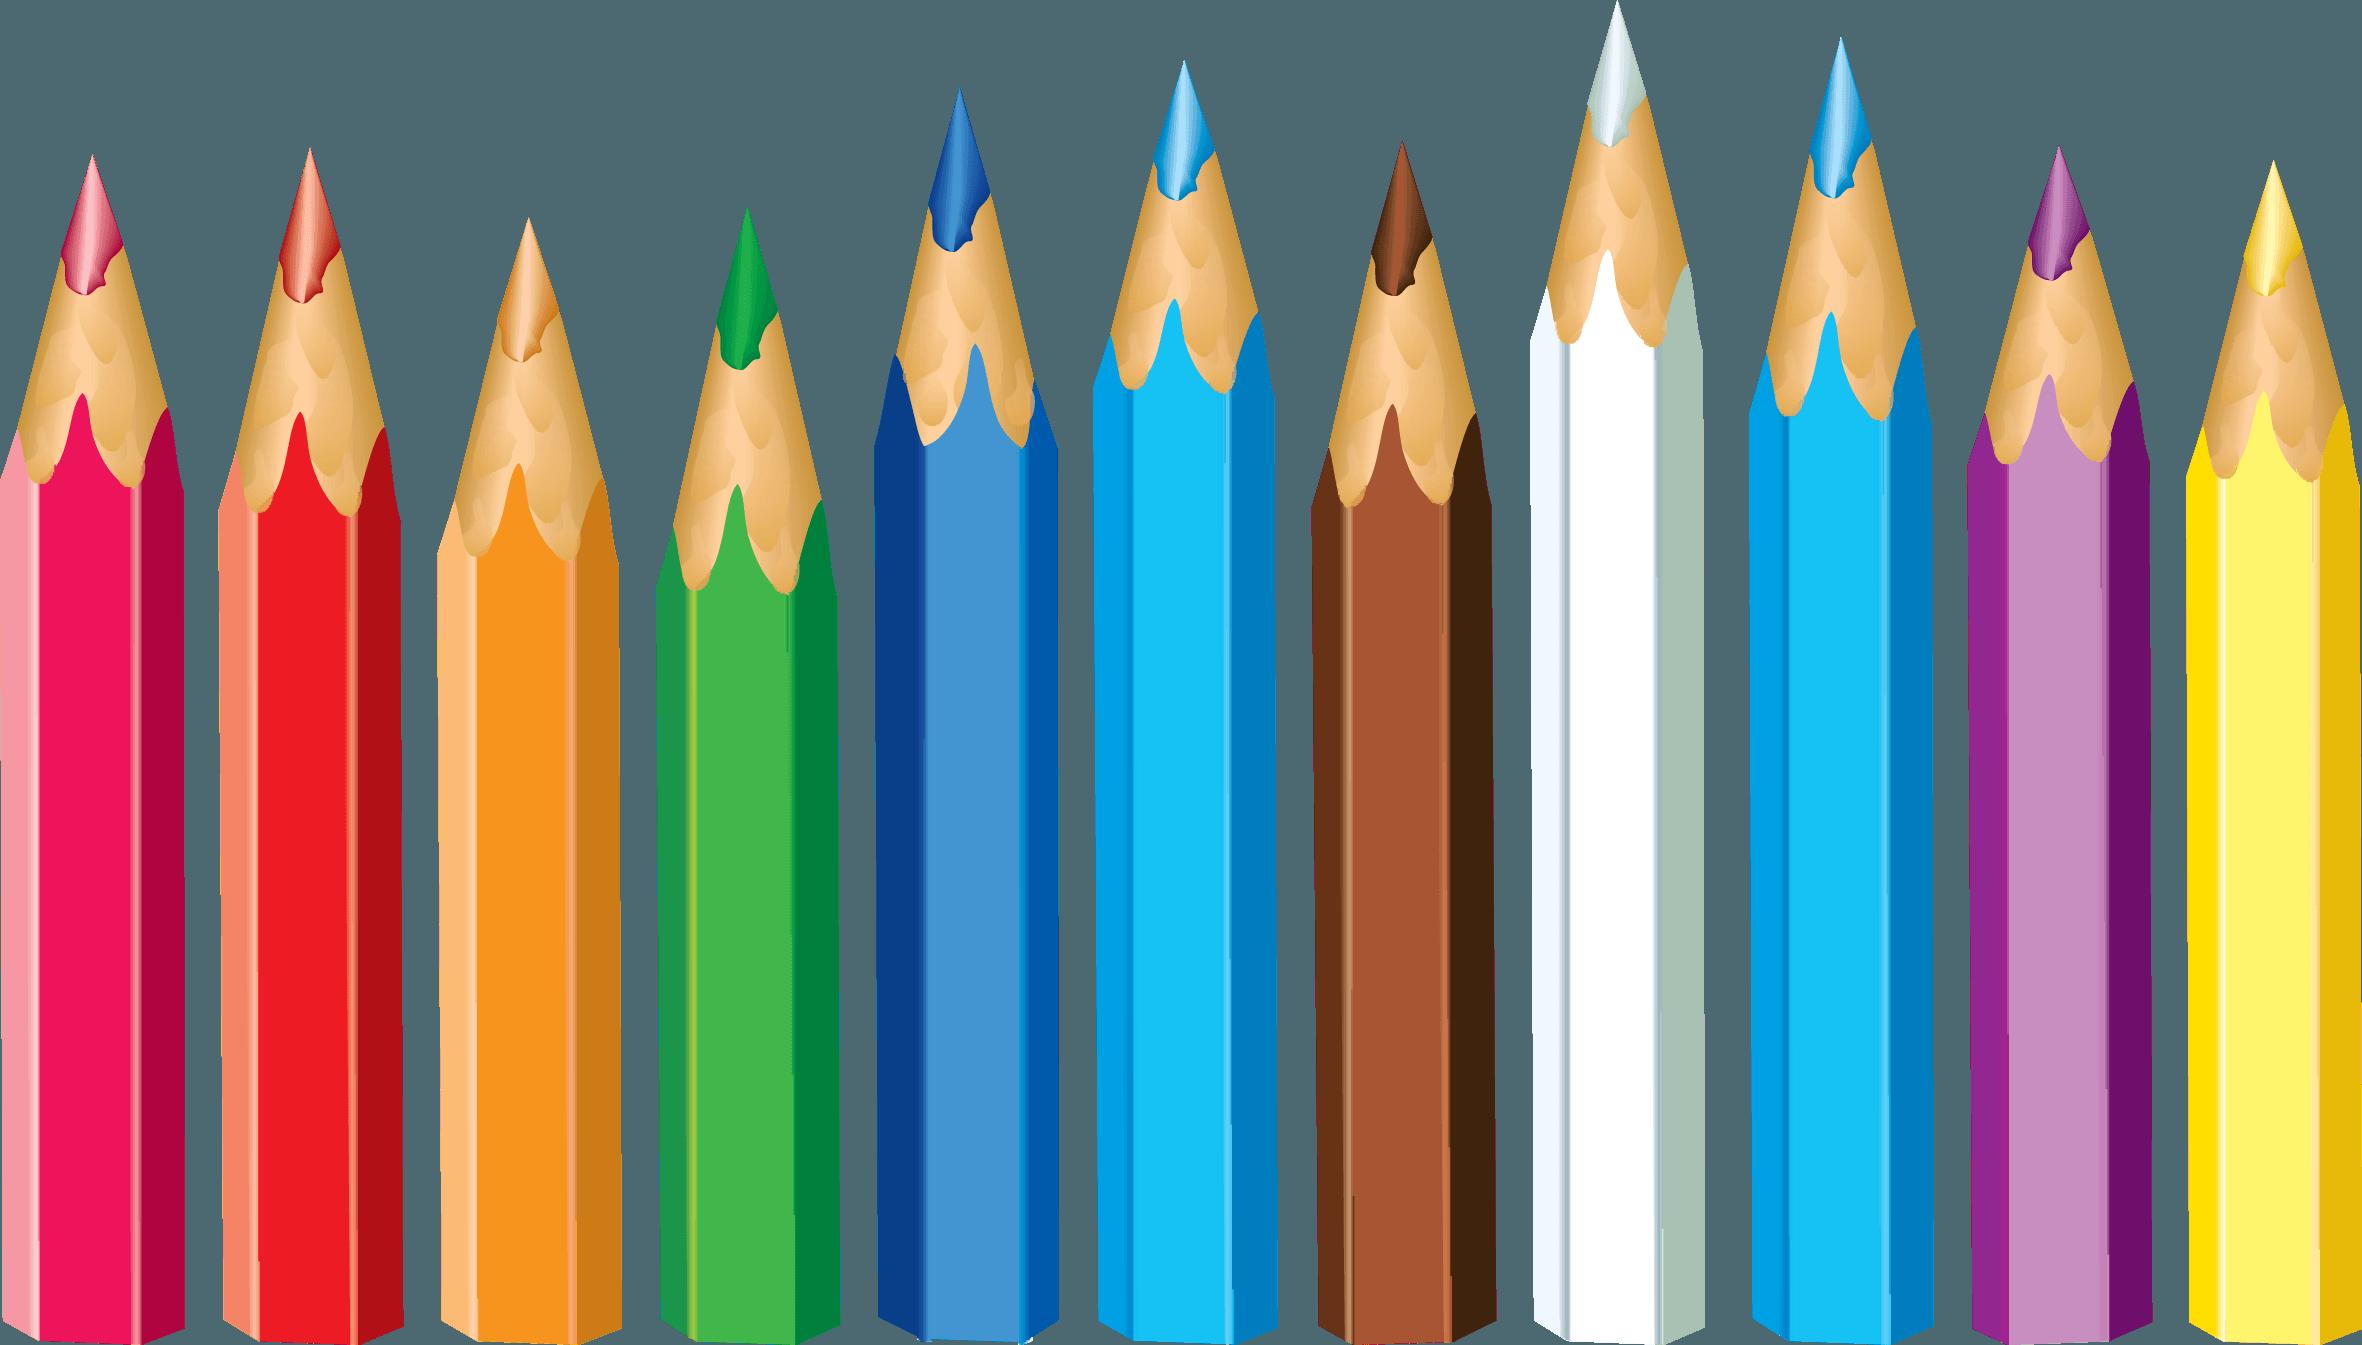 Pencils clipart png 5 » PNG Image.